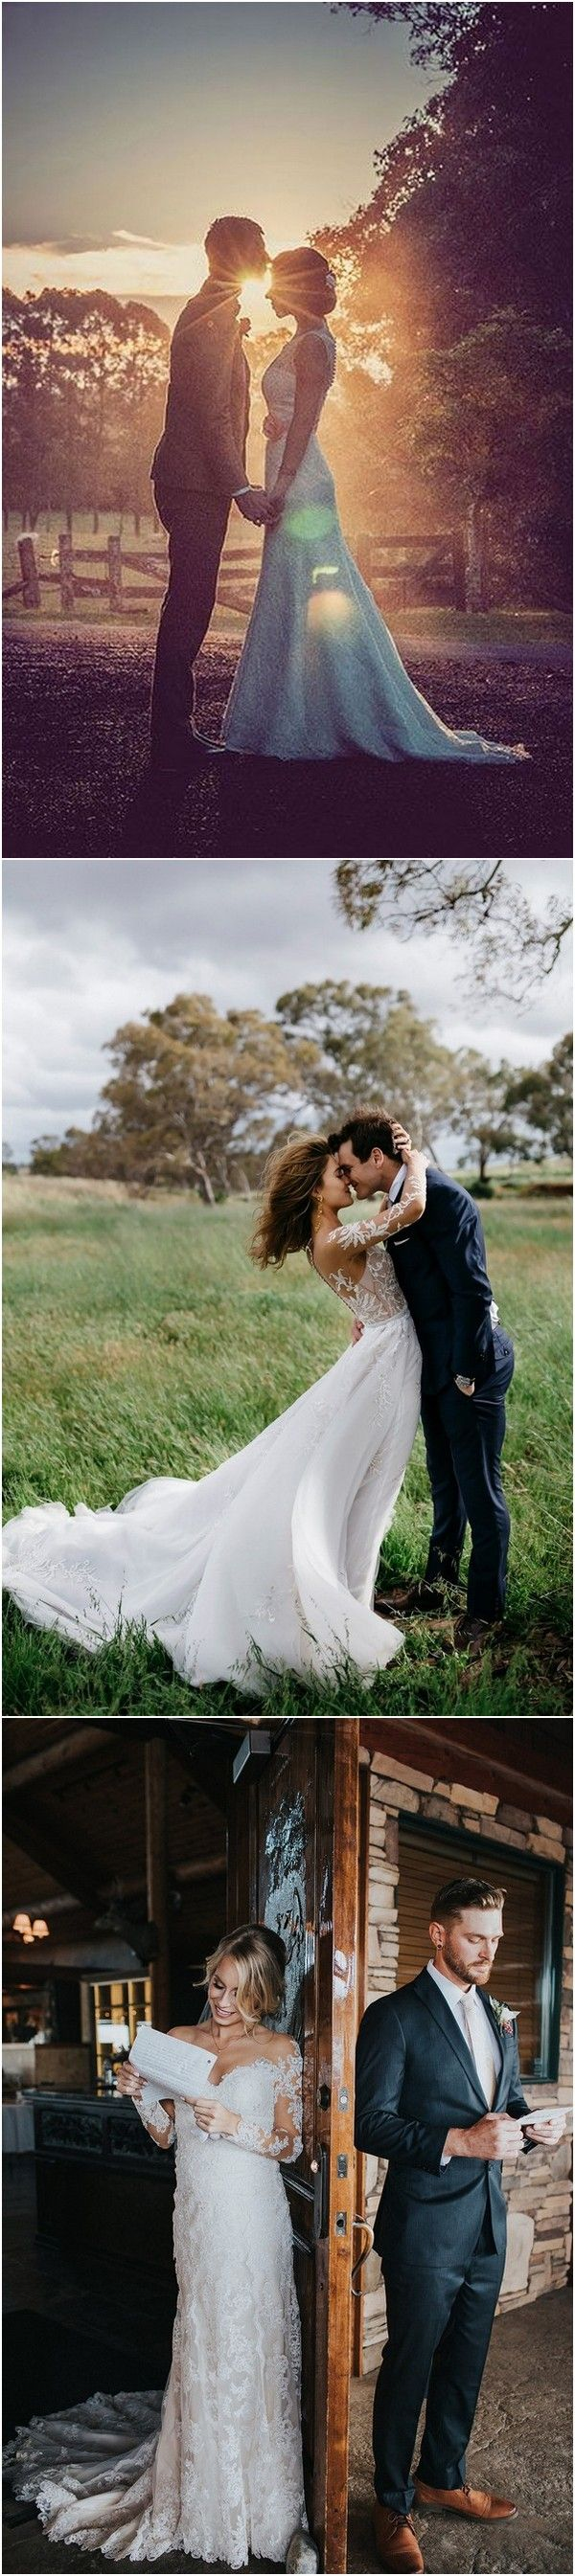 Romantic bride and groom wedding photo ideas #wedding #weddingphotos #weddingideas